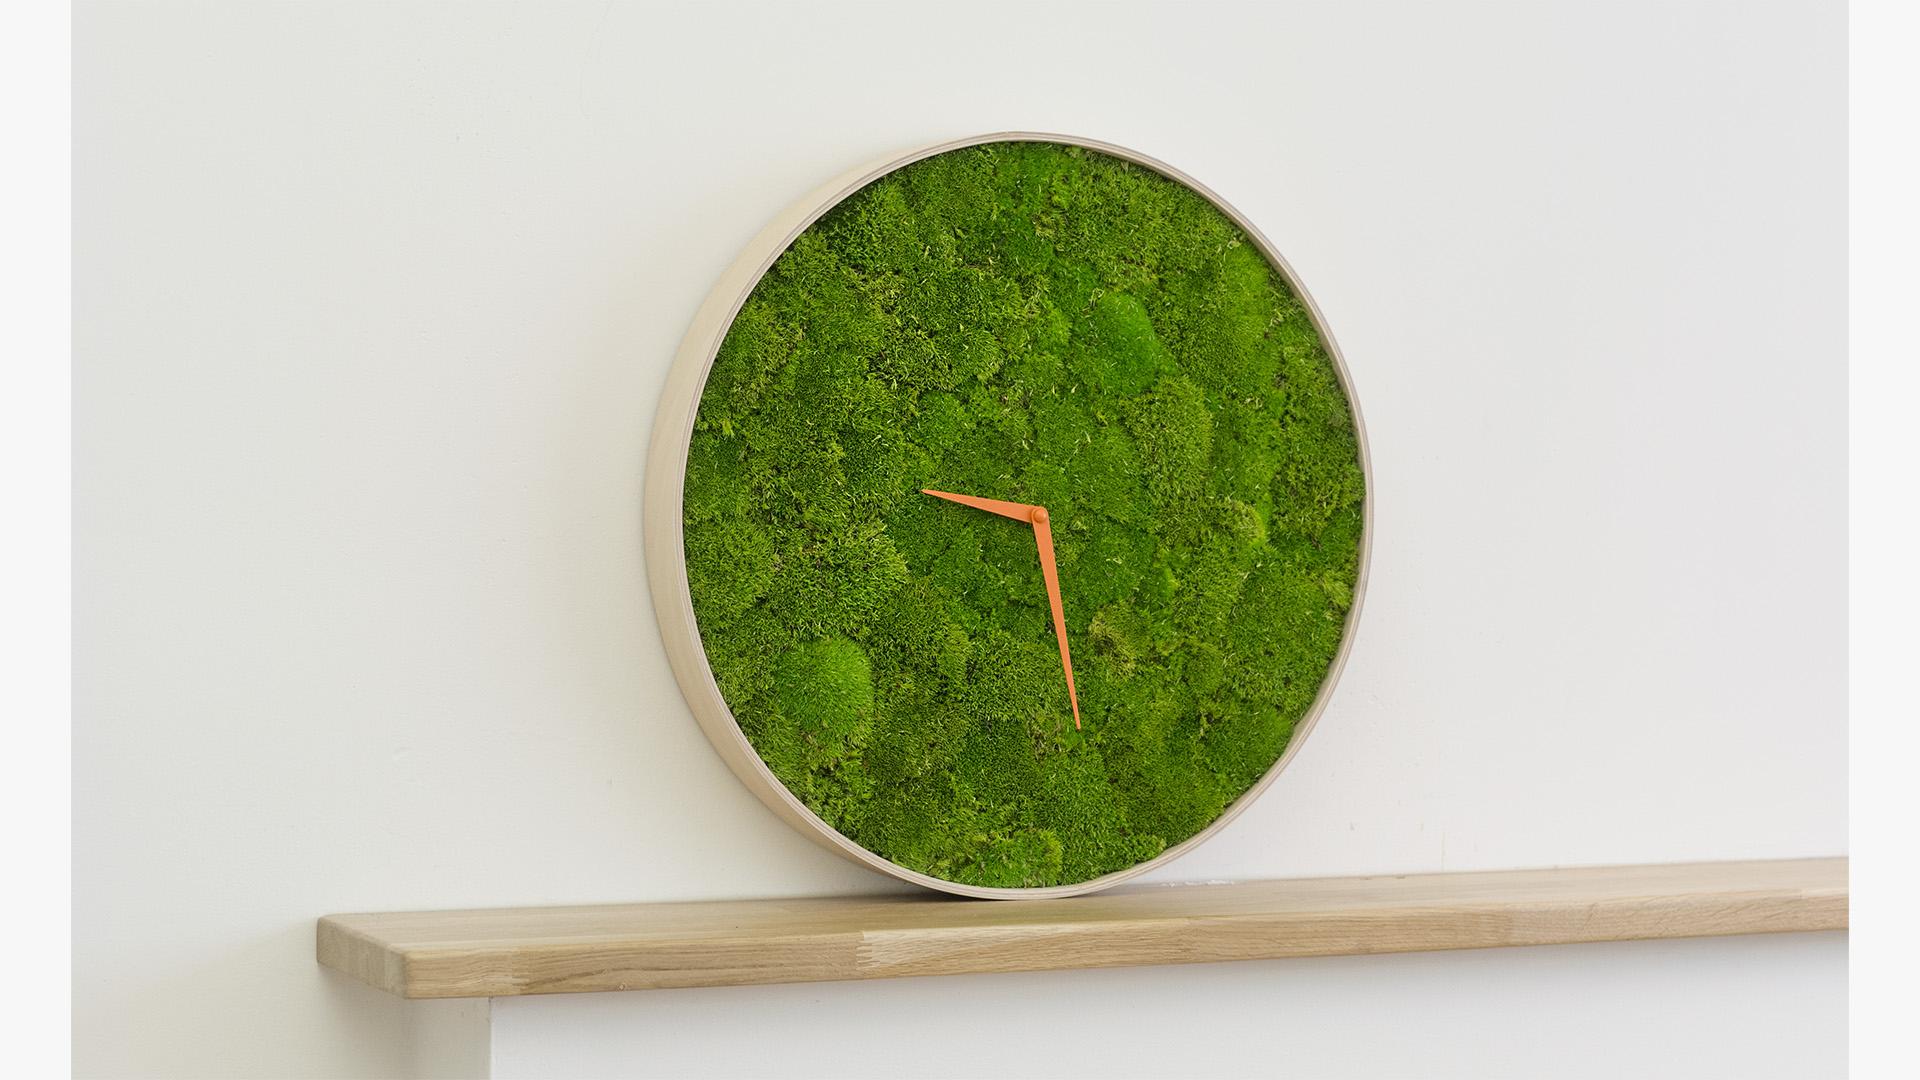 moss, wood, clock, wall clock, green, design, art, architecture, interior design